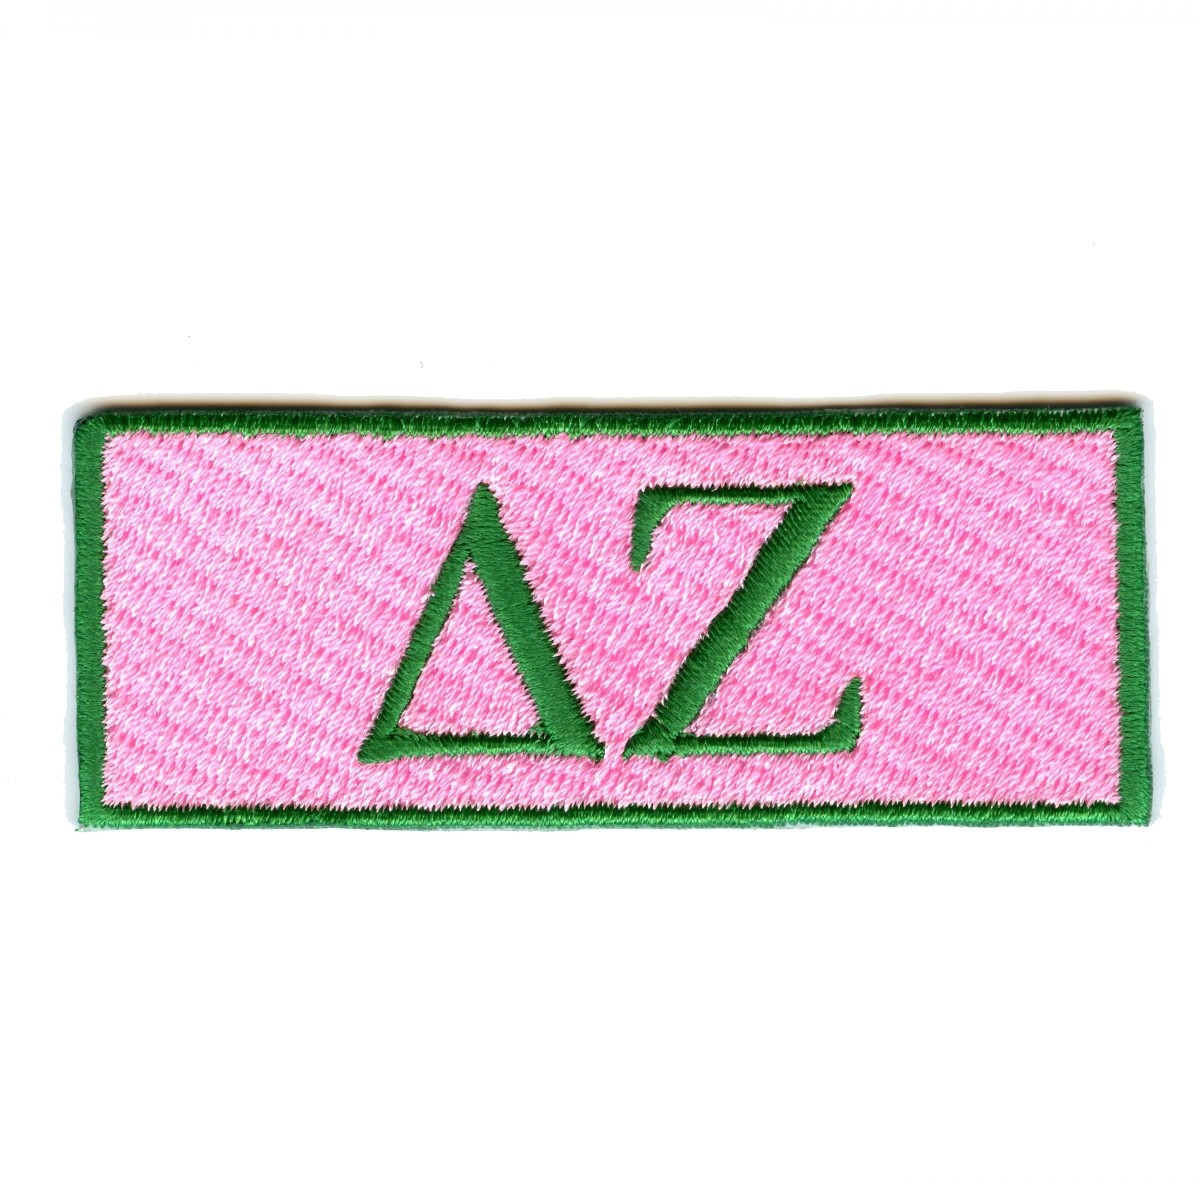 Delta Zeta Sorority Box Logo Iron On Patch.